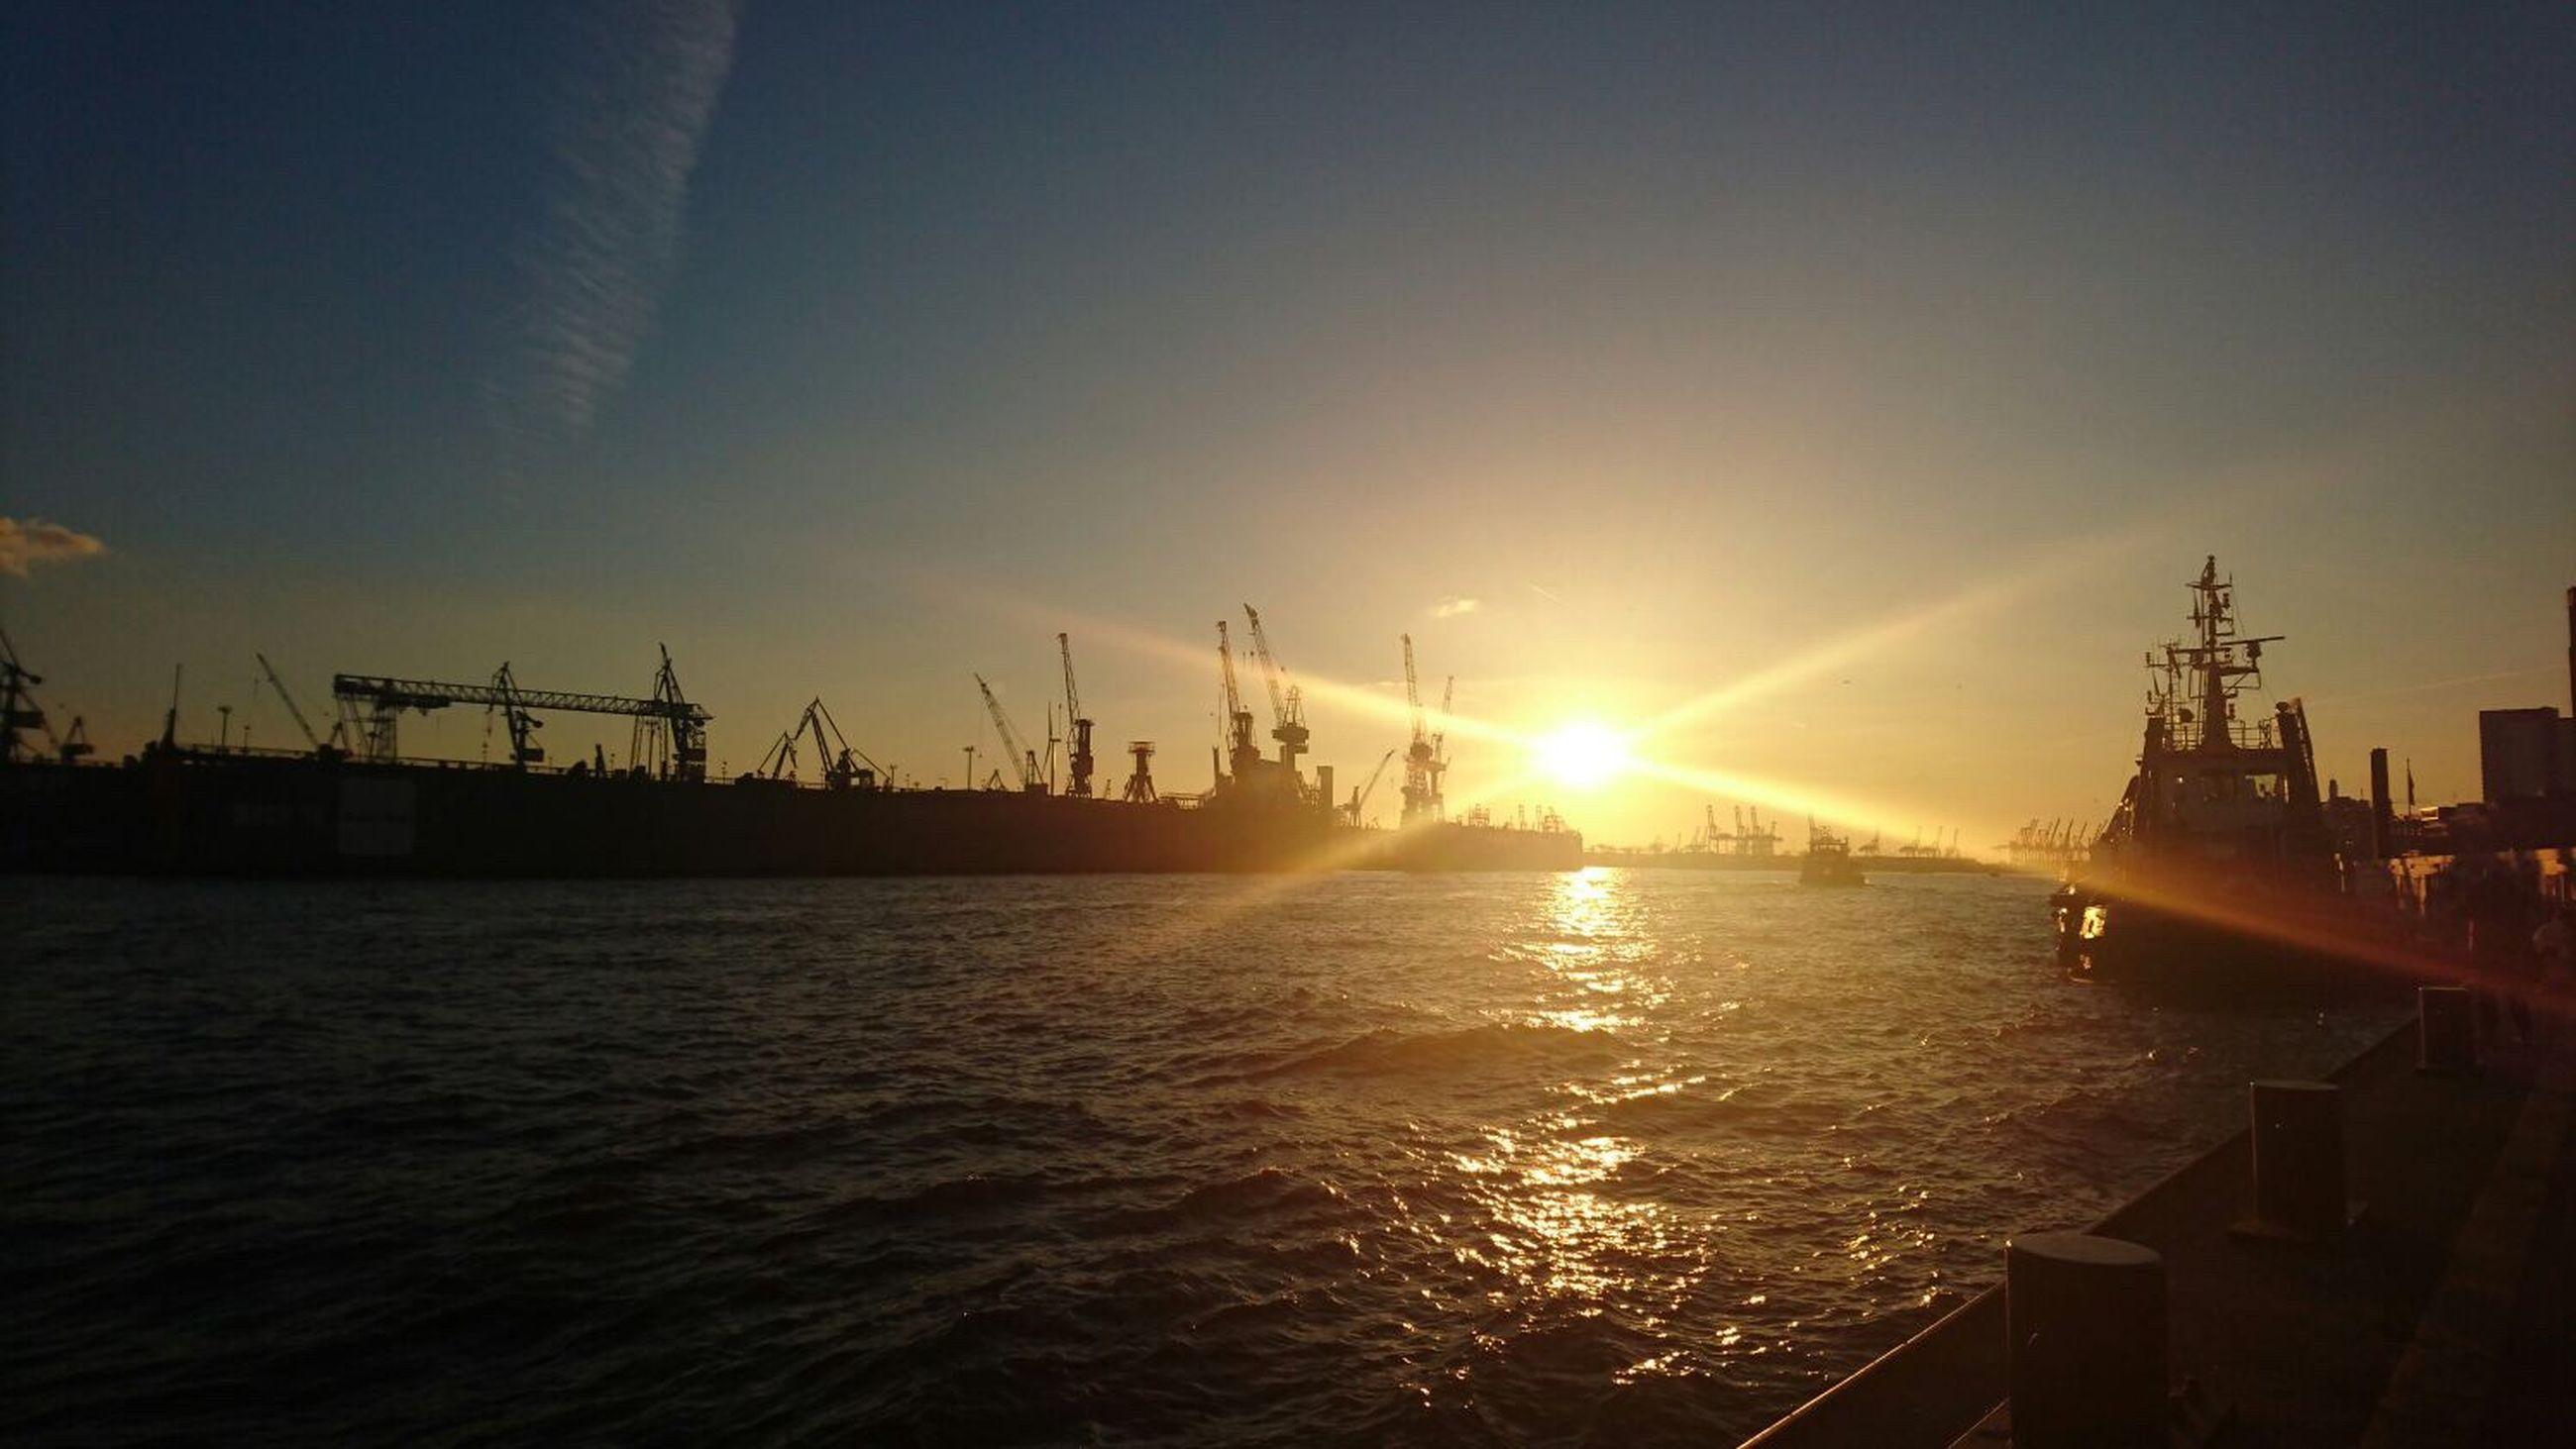 sun, sunset, water, crane - construction machinery, commercial dock, crane, harbor, sunlight, sky, fuel and power generation, industry, sunbeam, waterfront, silhouette, built structure, sea, alternative energy, nautical vessel, renewable energy, development